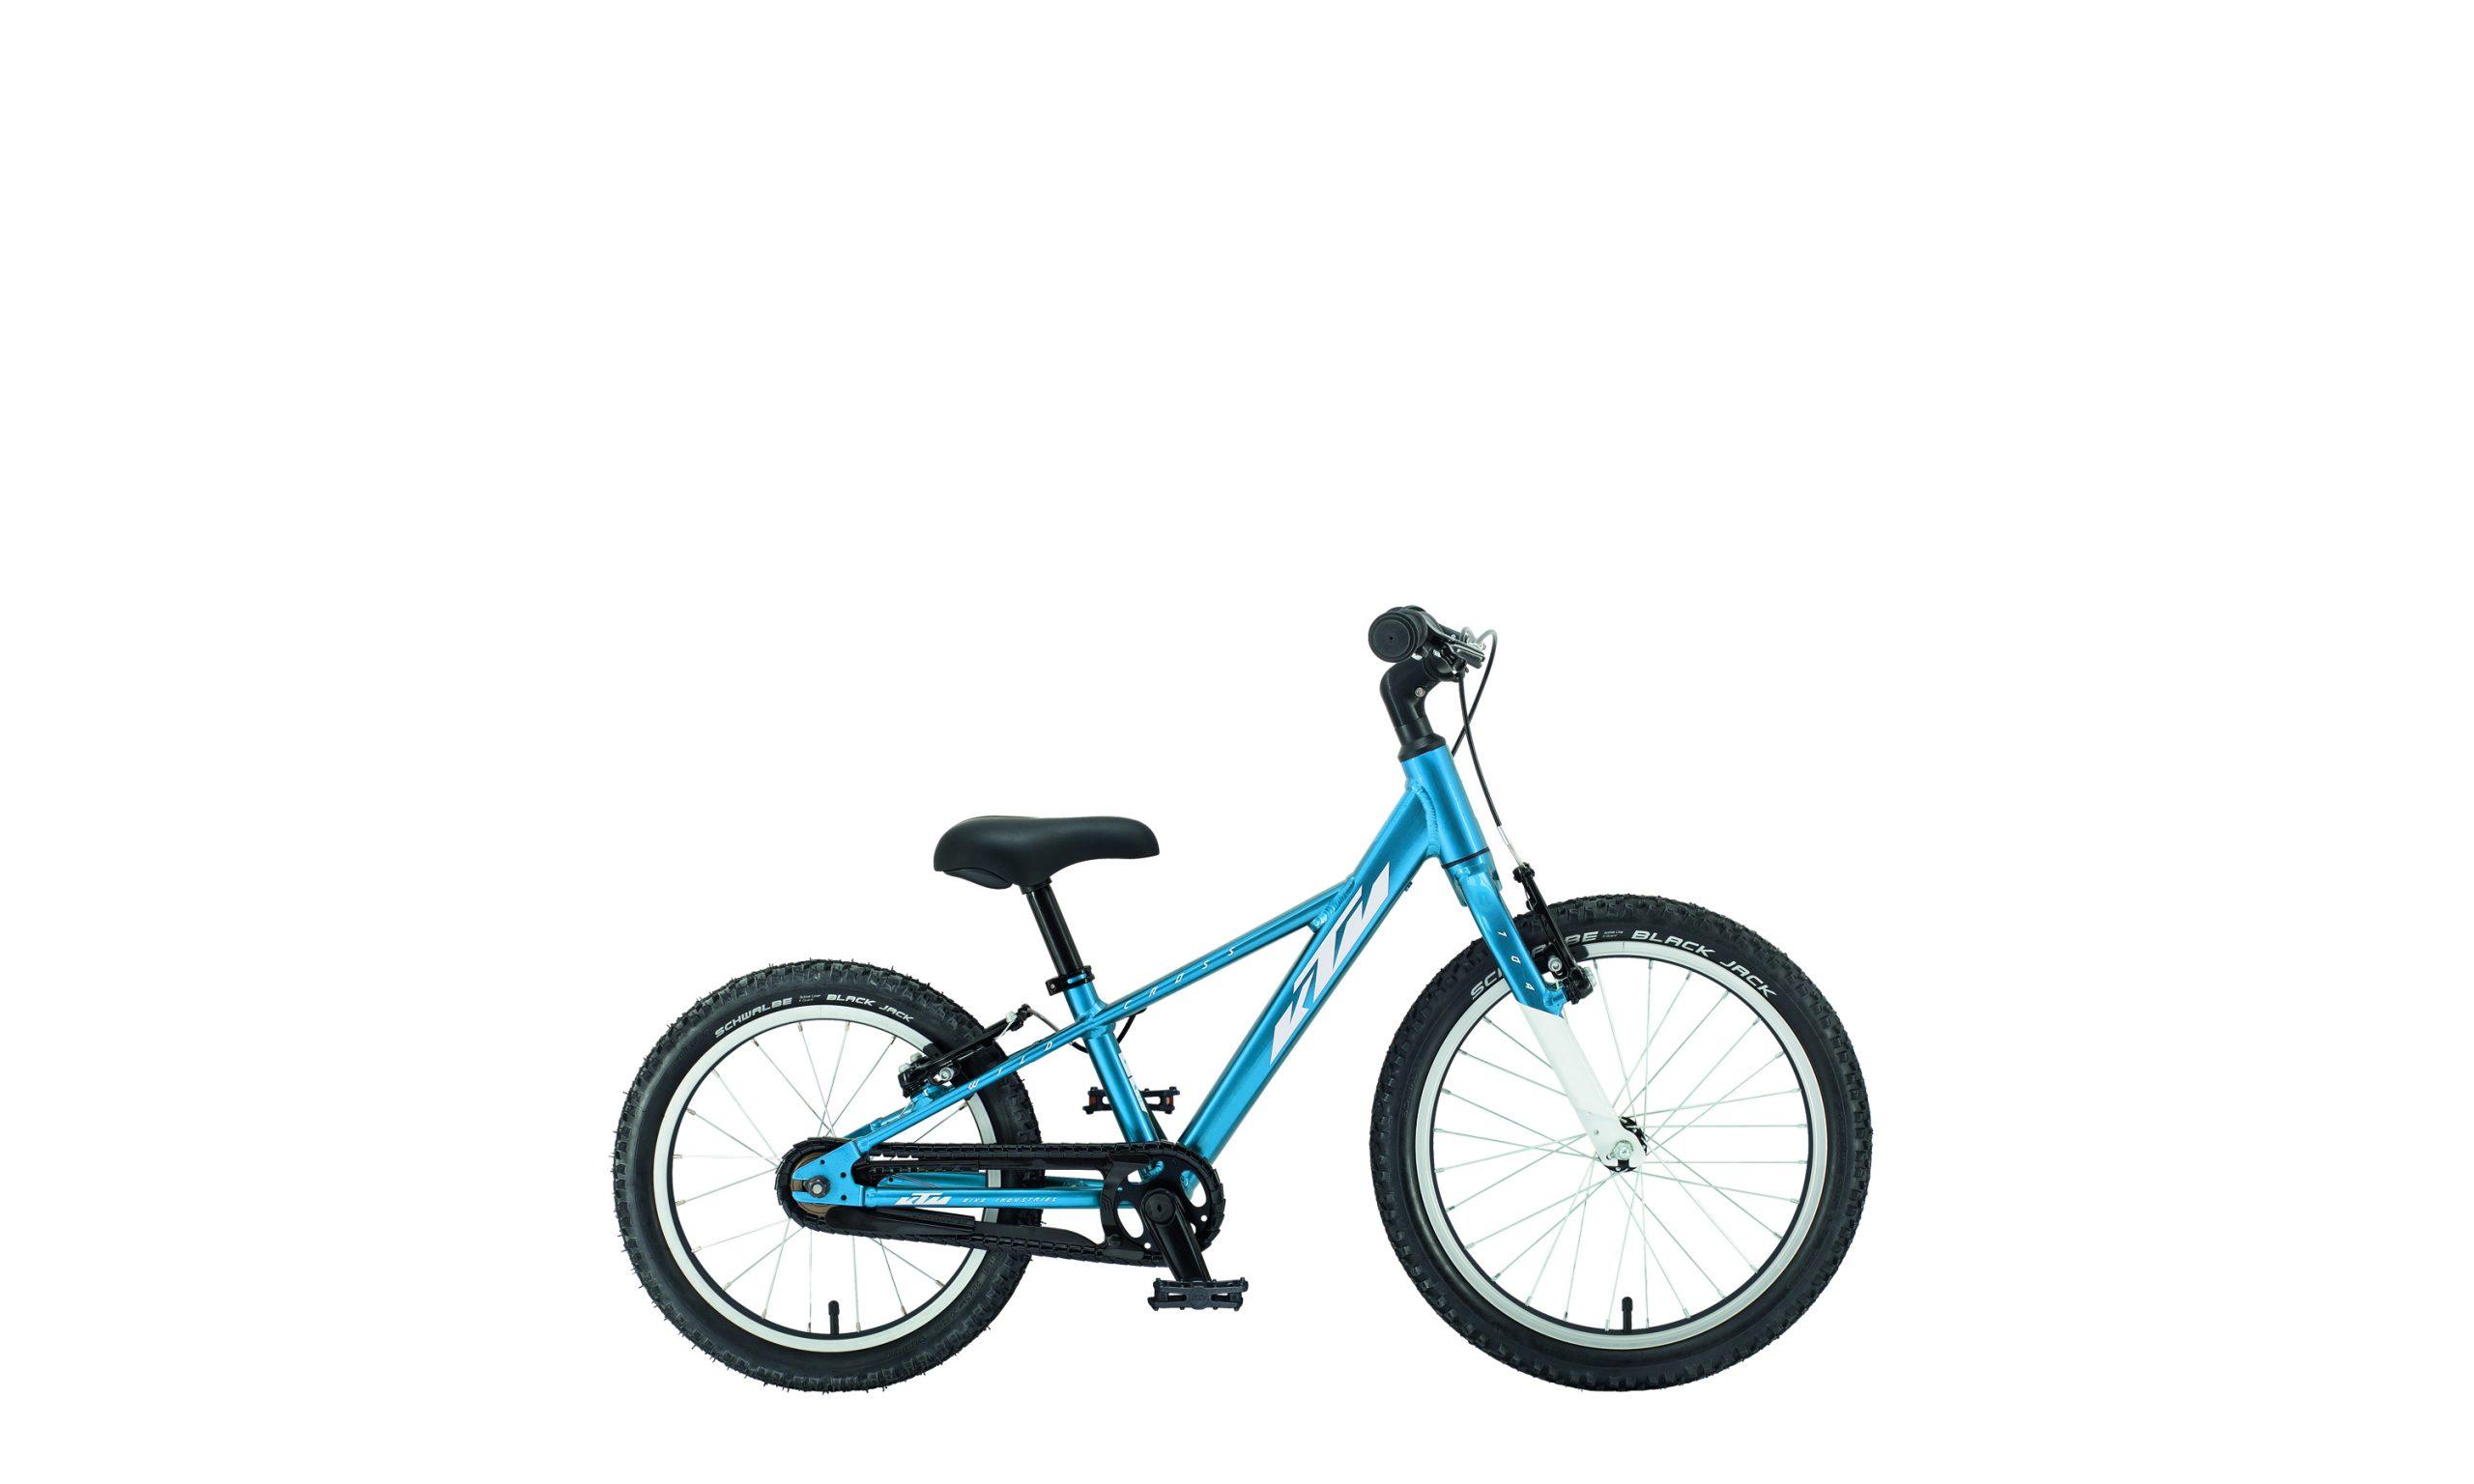 KTM Bike - WILD CROSS 16